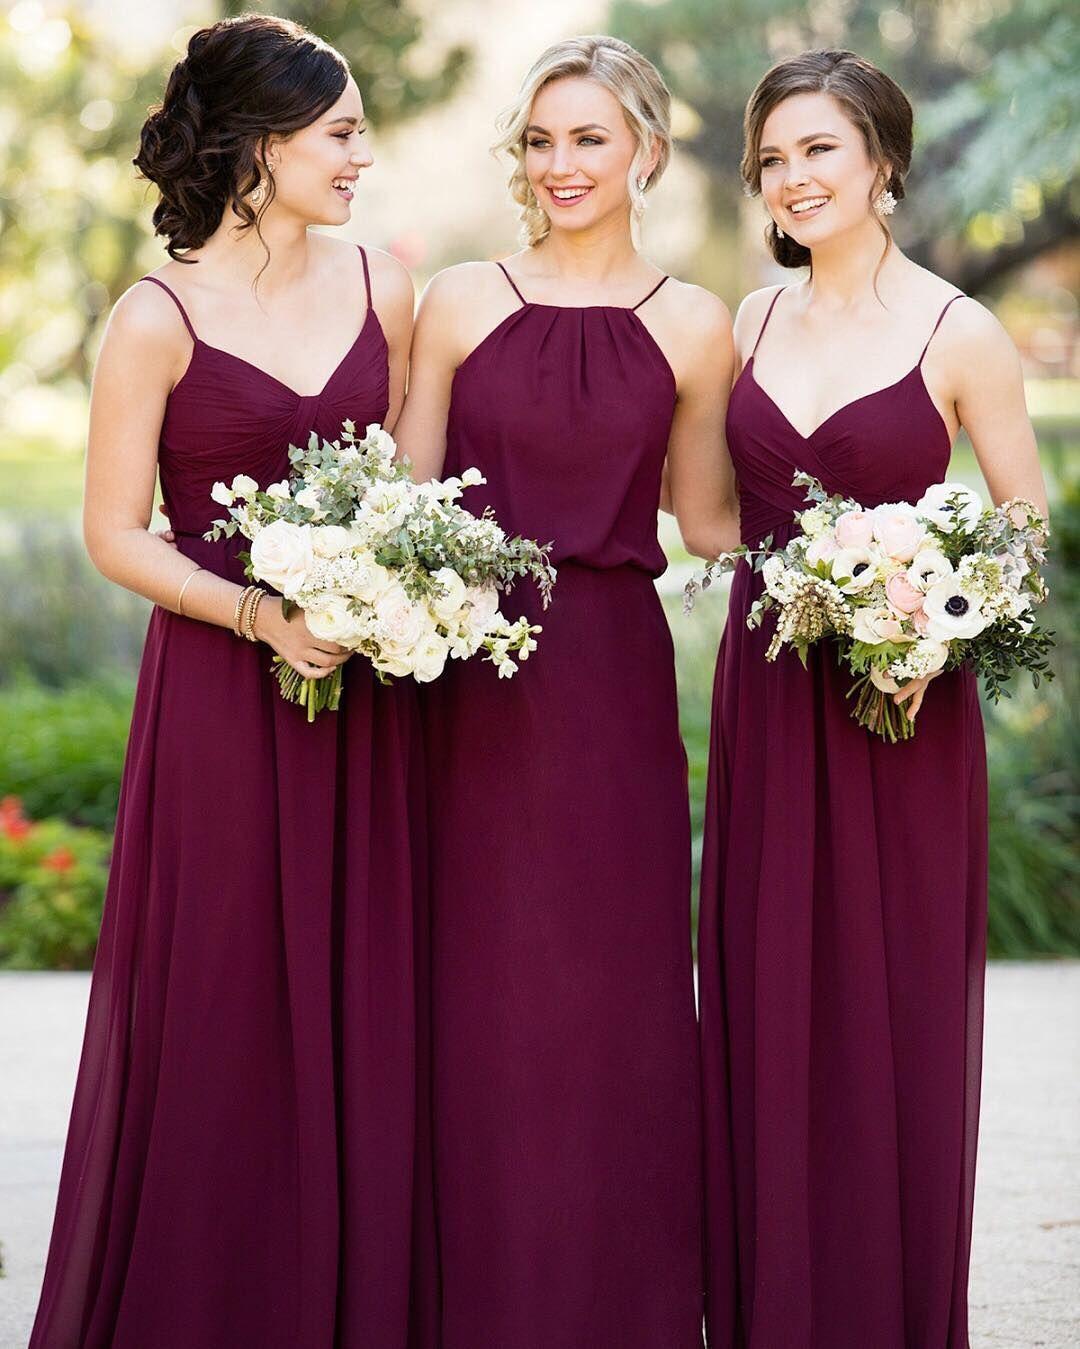 Pin by Michele Elizabeth Robey on Bridesmaids Pinterest Wedding